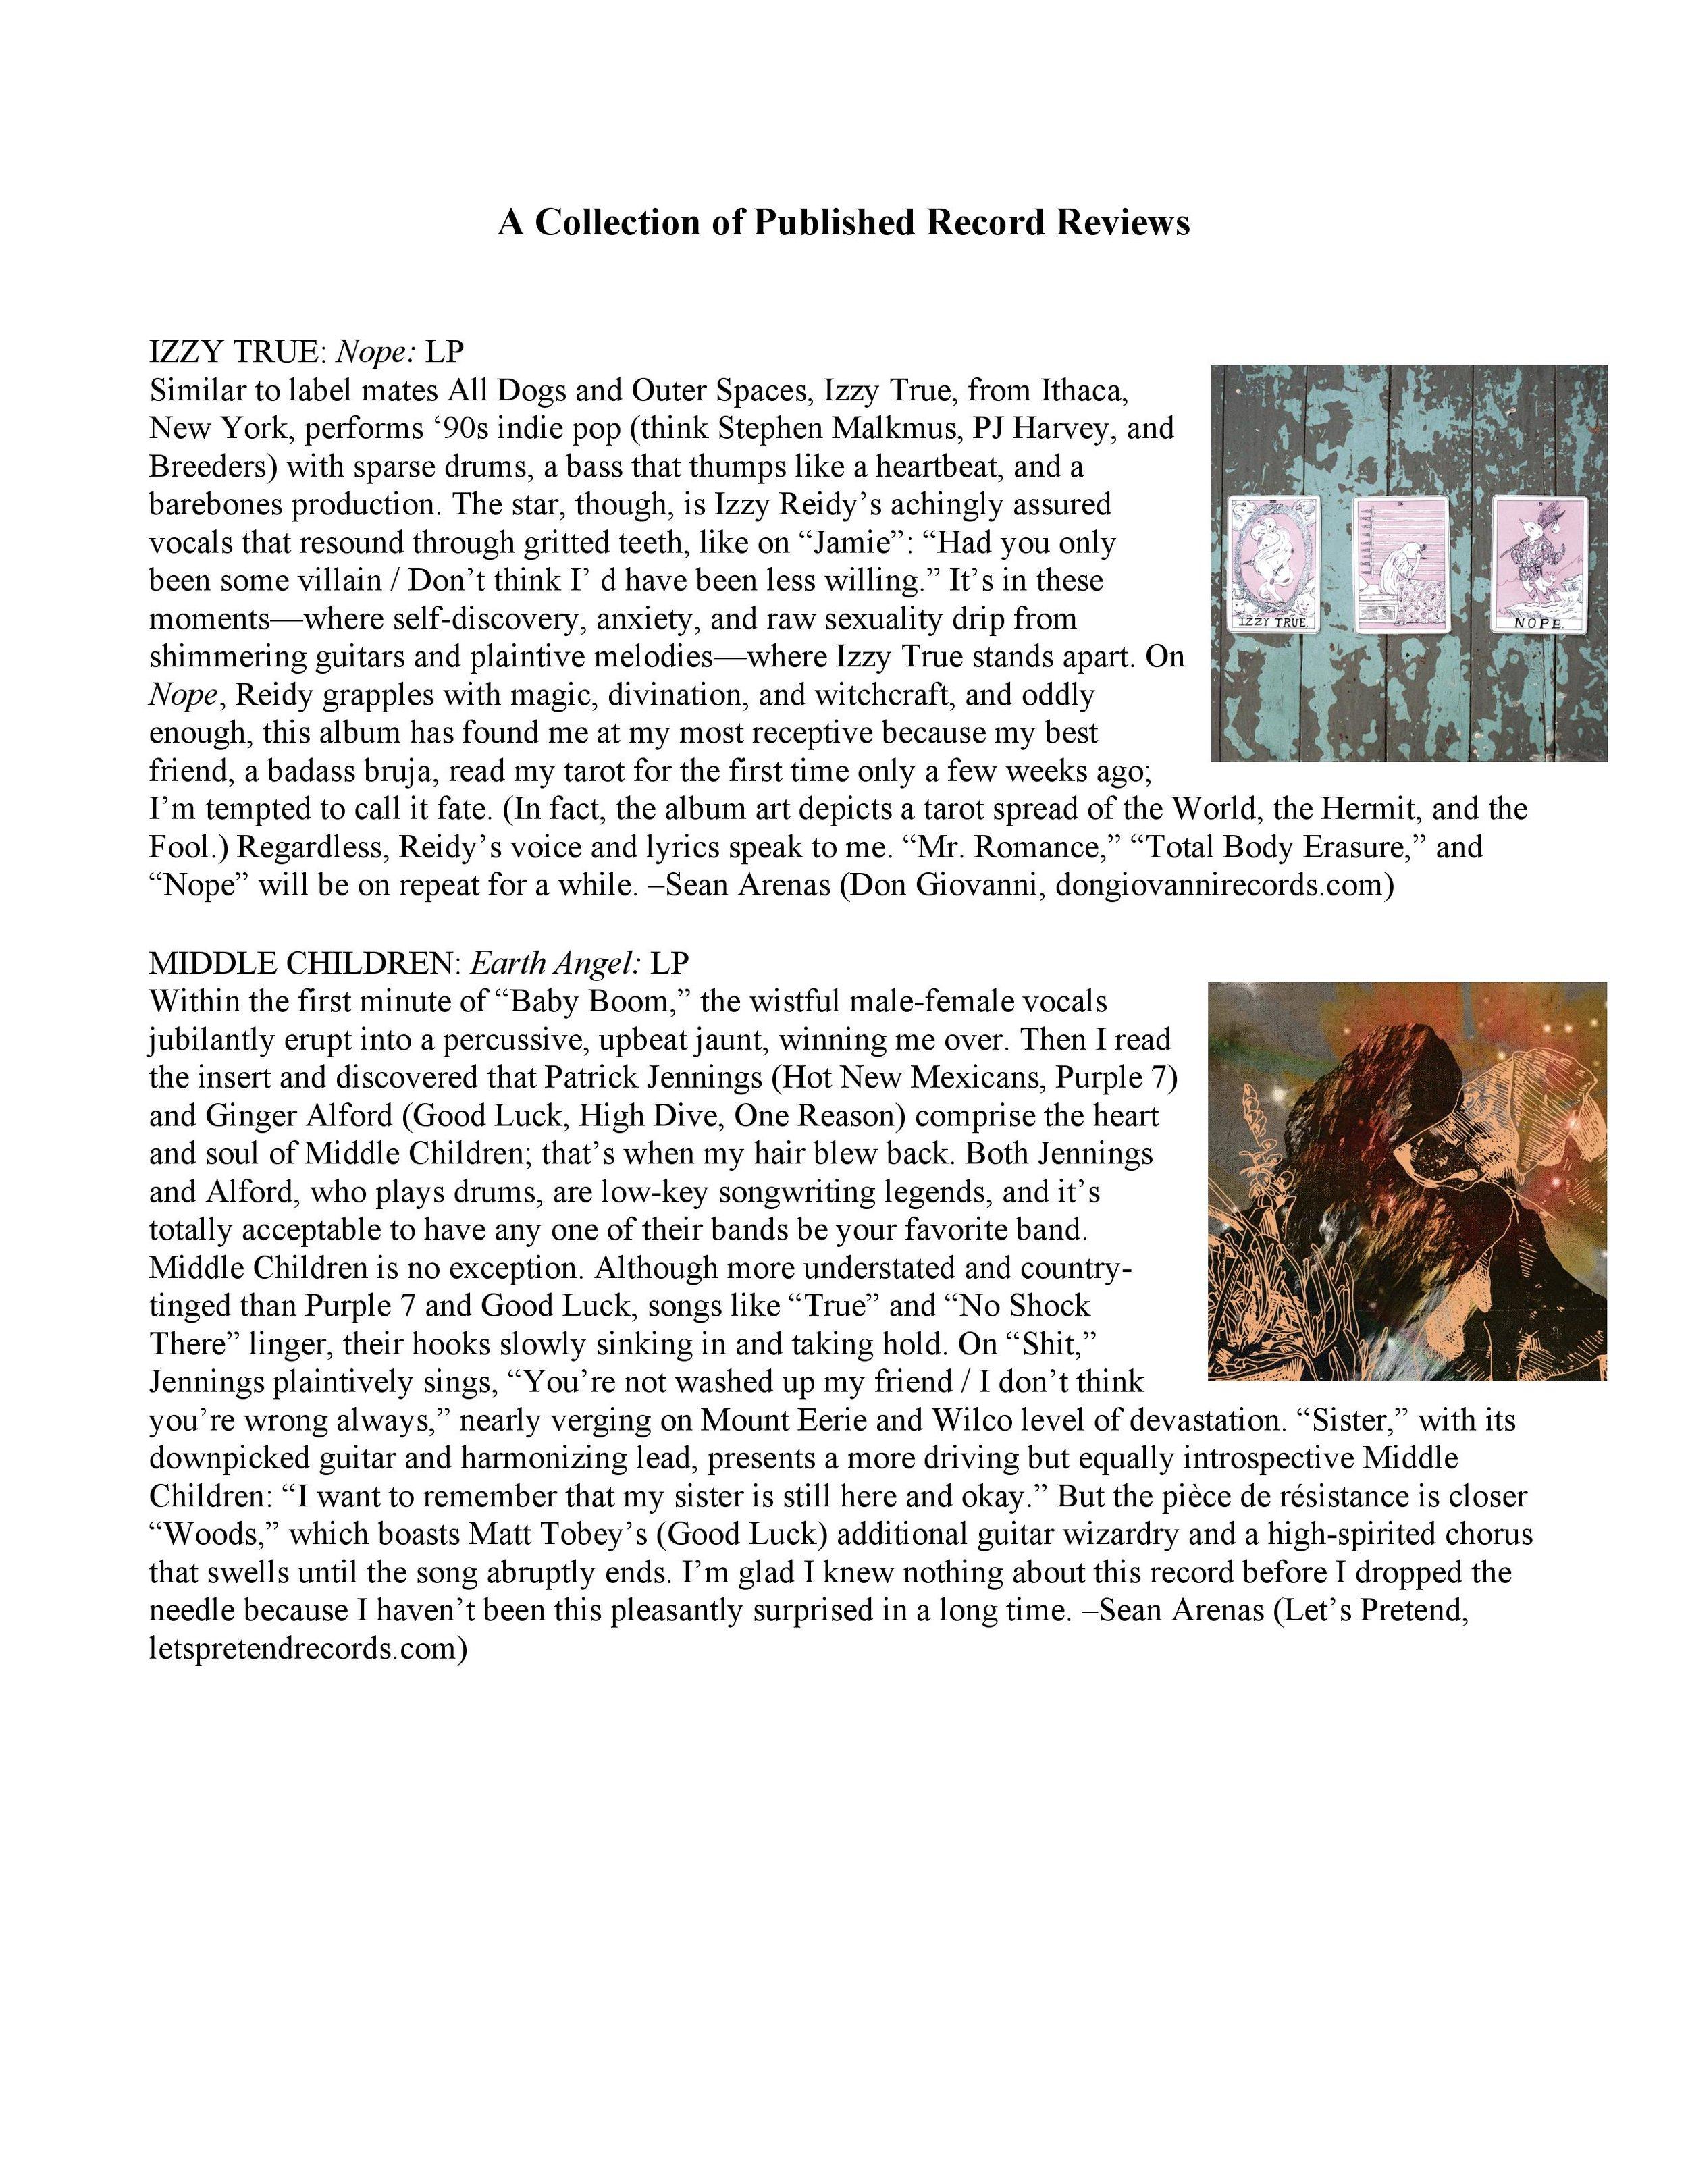 SEAN ARENAS_RECORD REV WRITING SAMPLES-page-001.jpg